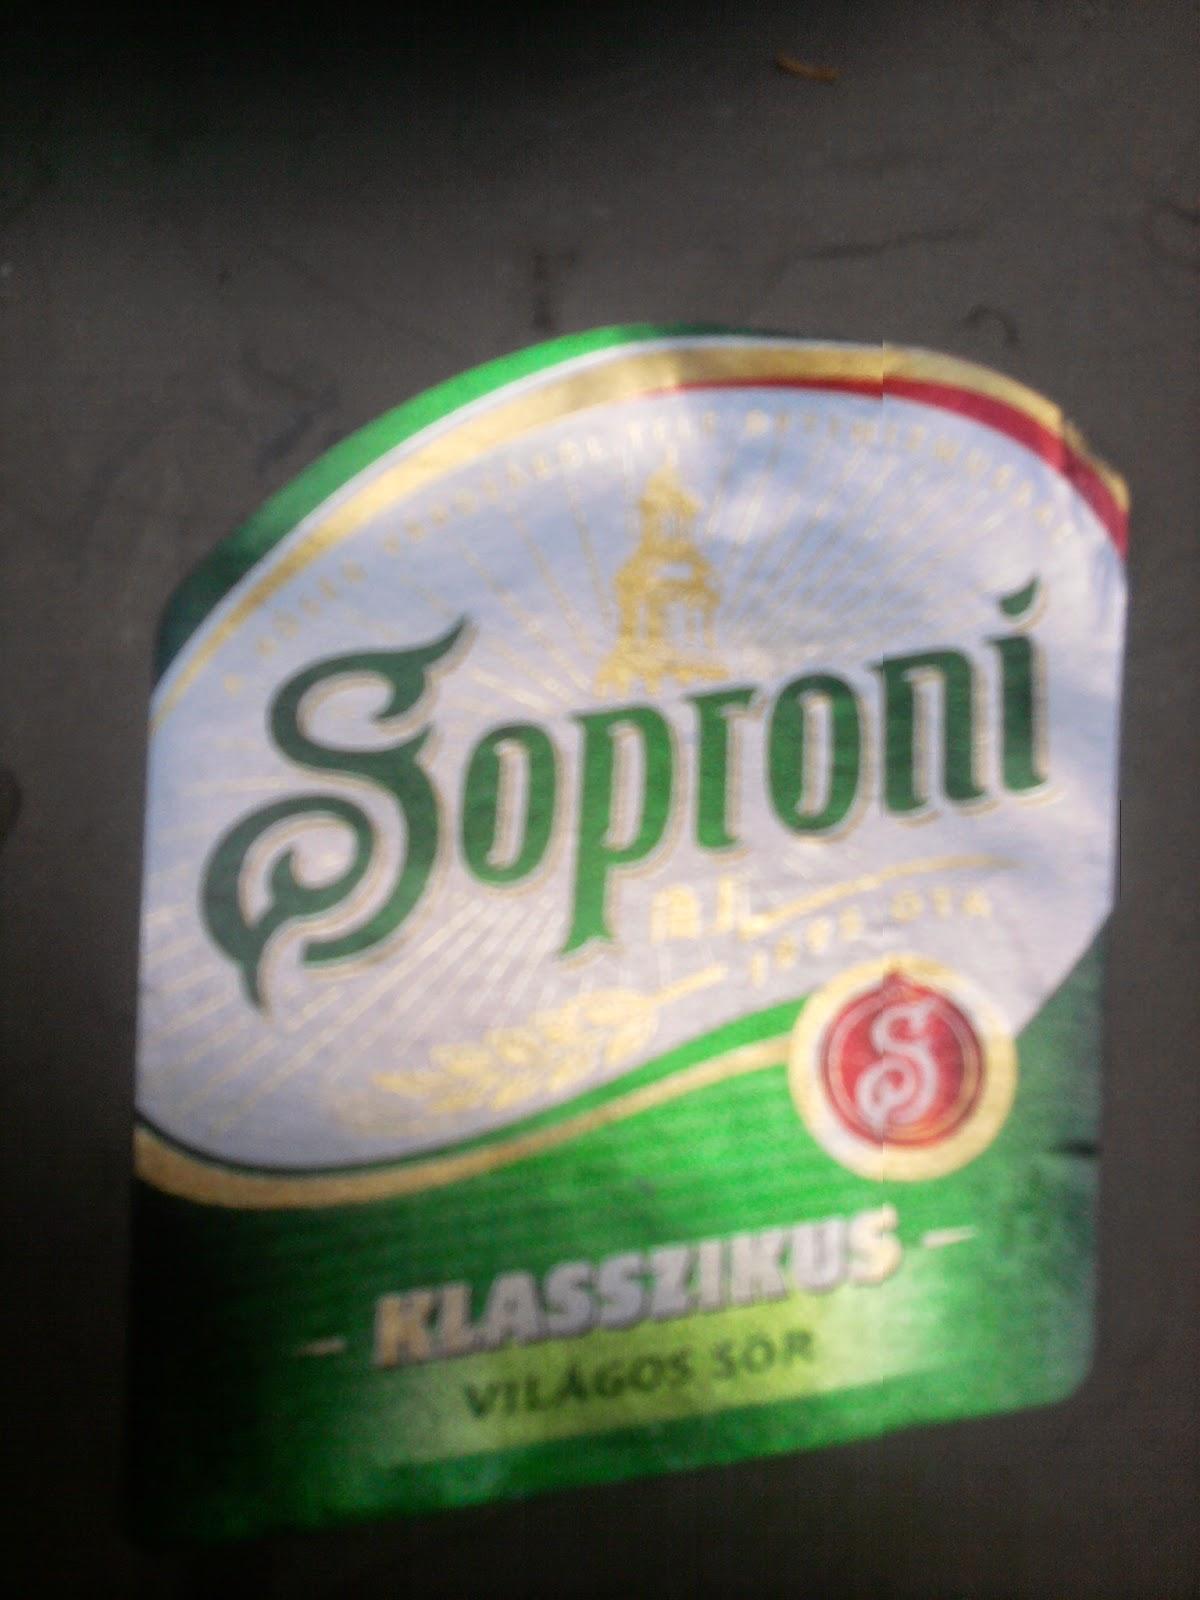 Nacionalizmus, Sopron, Hűség Városa, sör, drog, alkoholizmus, reklám, manipuláció, nacionalizmus